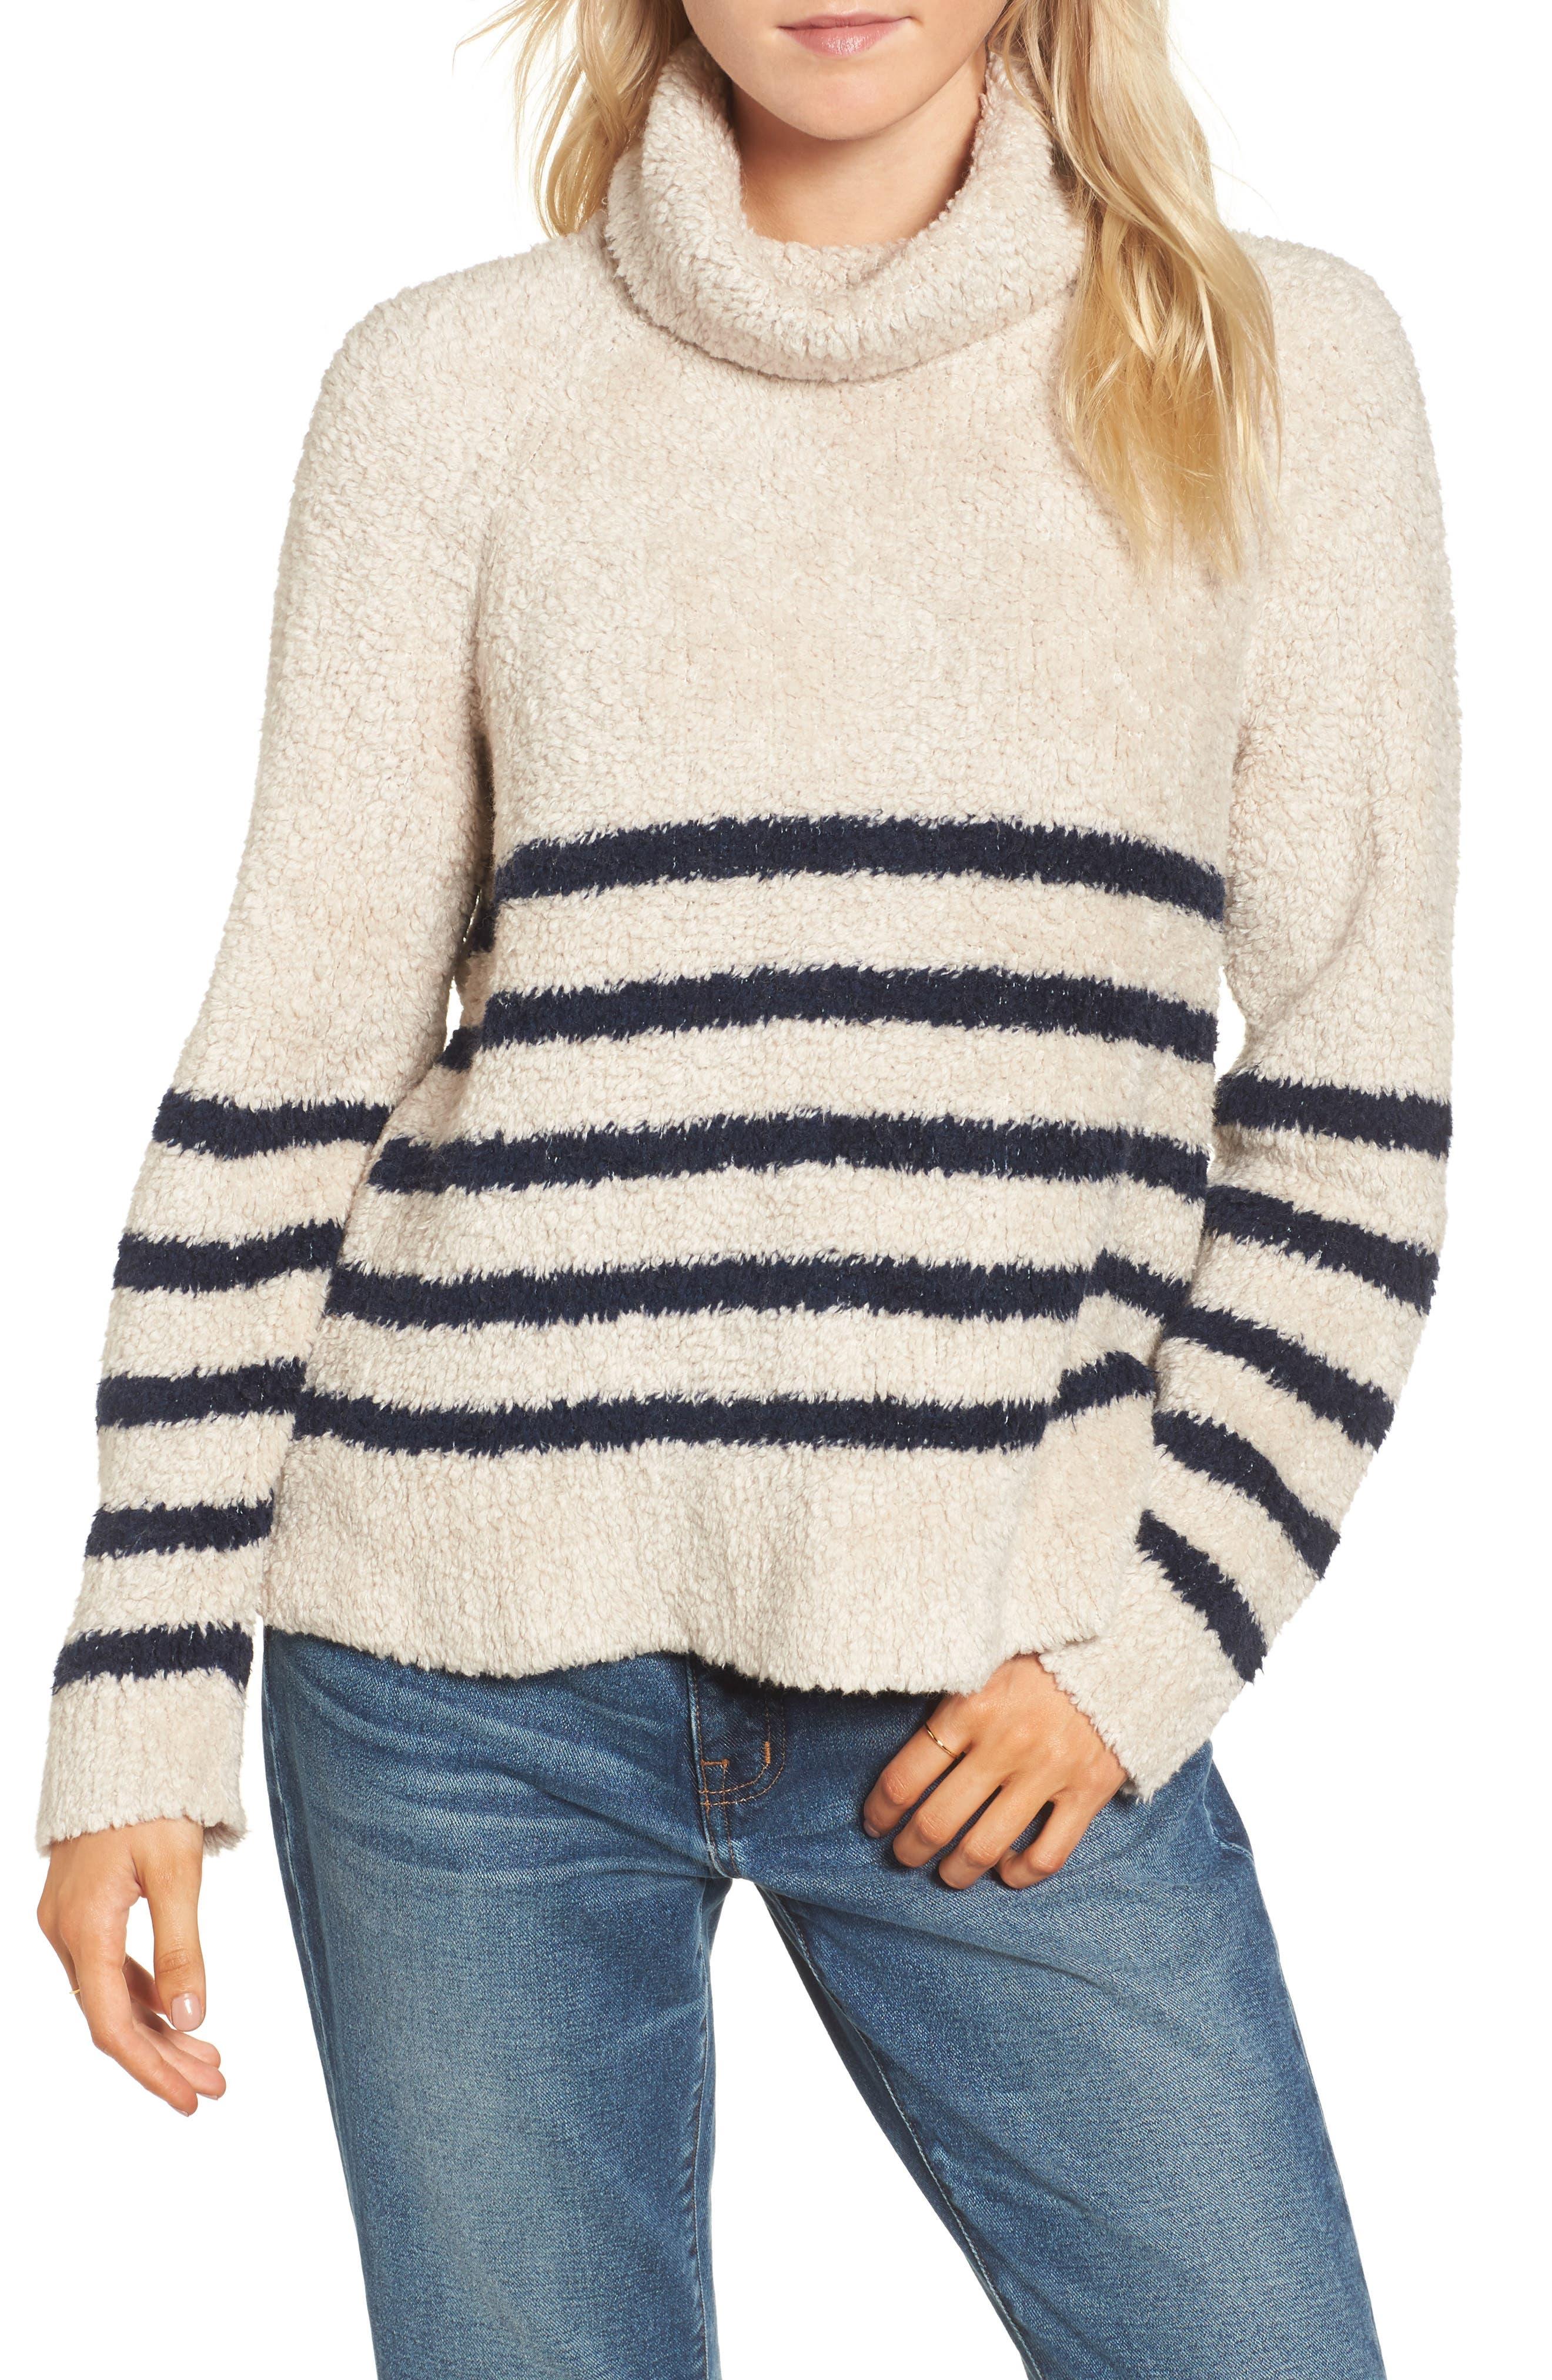 Mariner Stripe Turtleneck Sweater,                             Main thumbnail 1, color,                             090